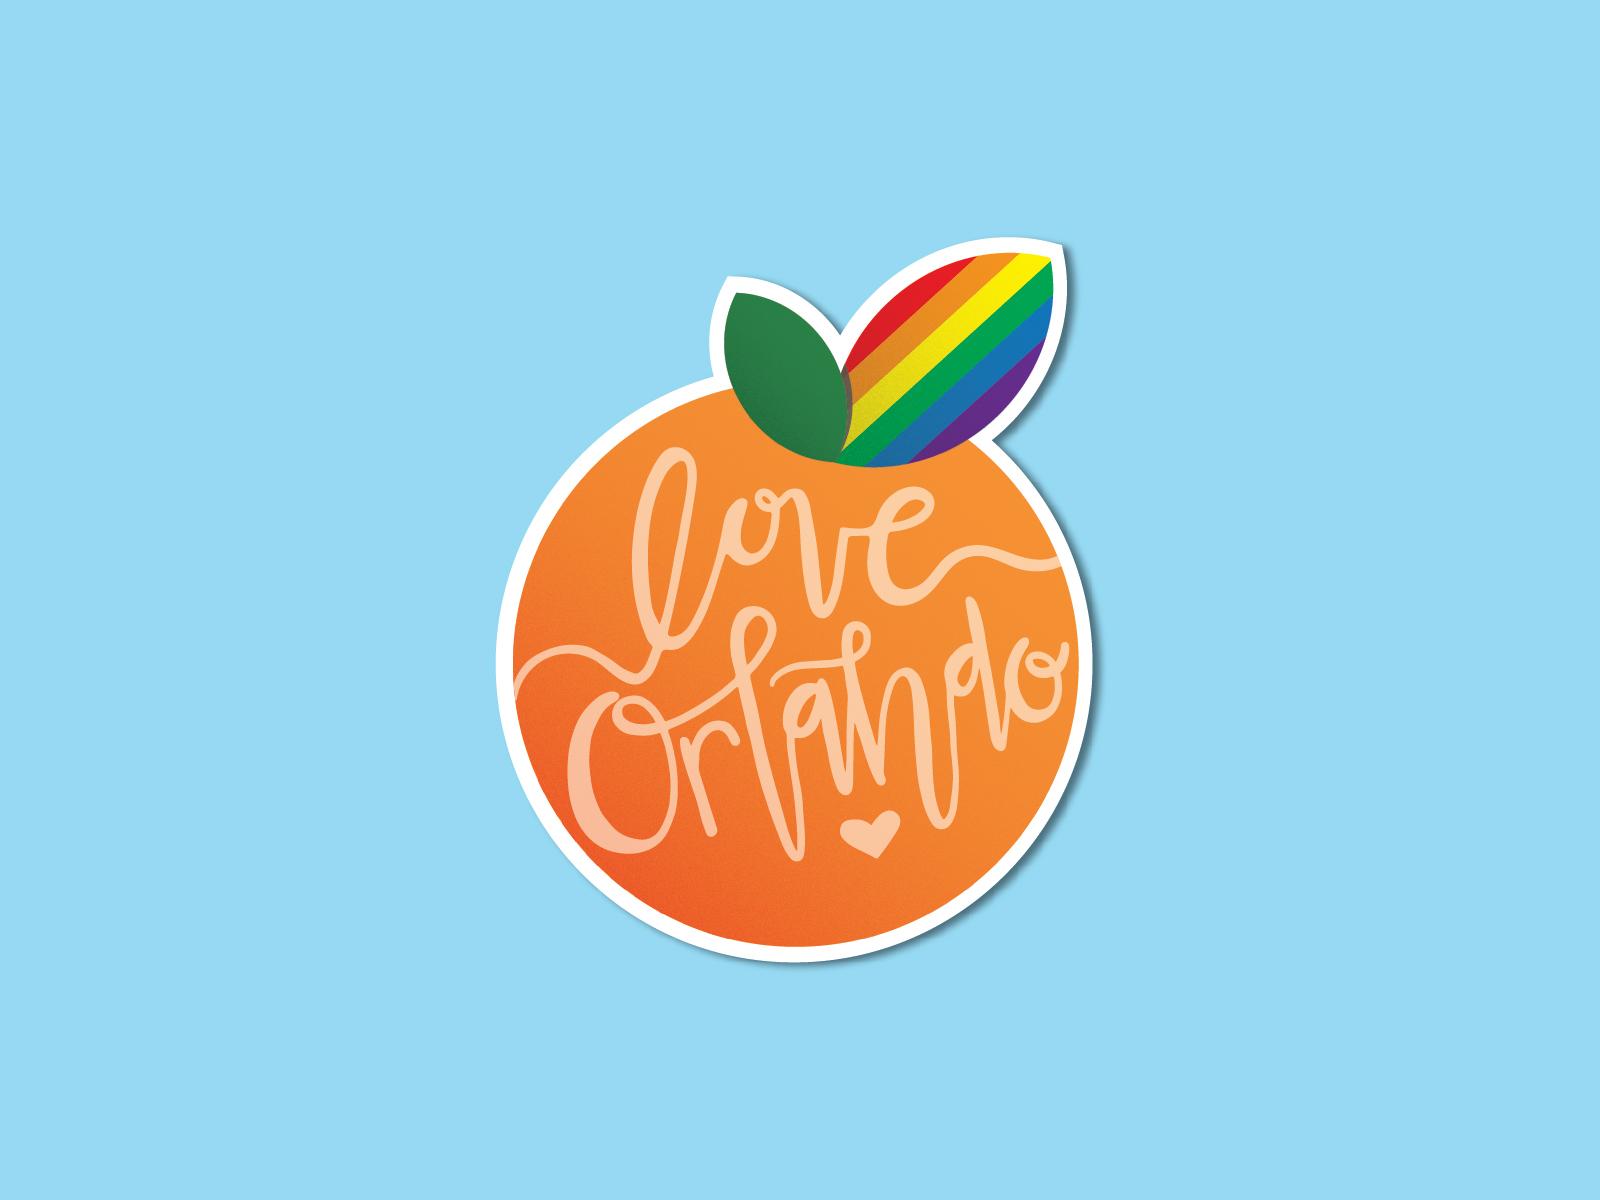 orange_large_vv.jpg